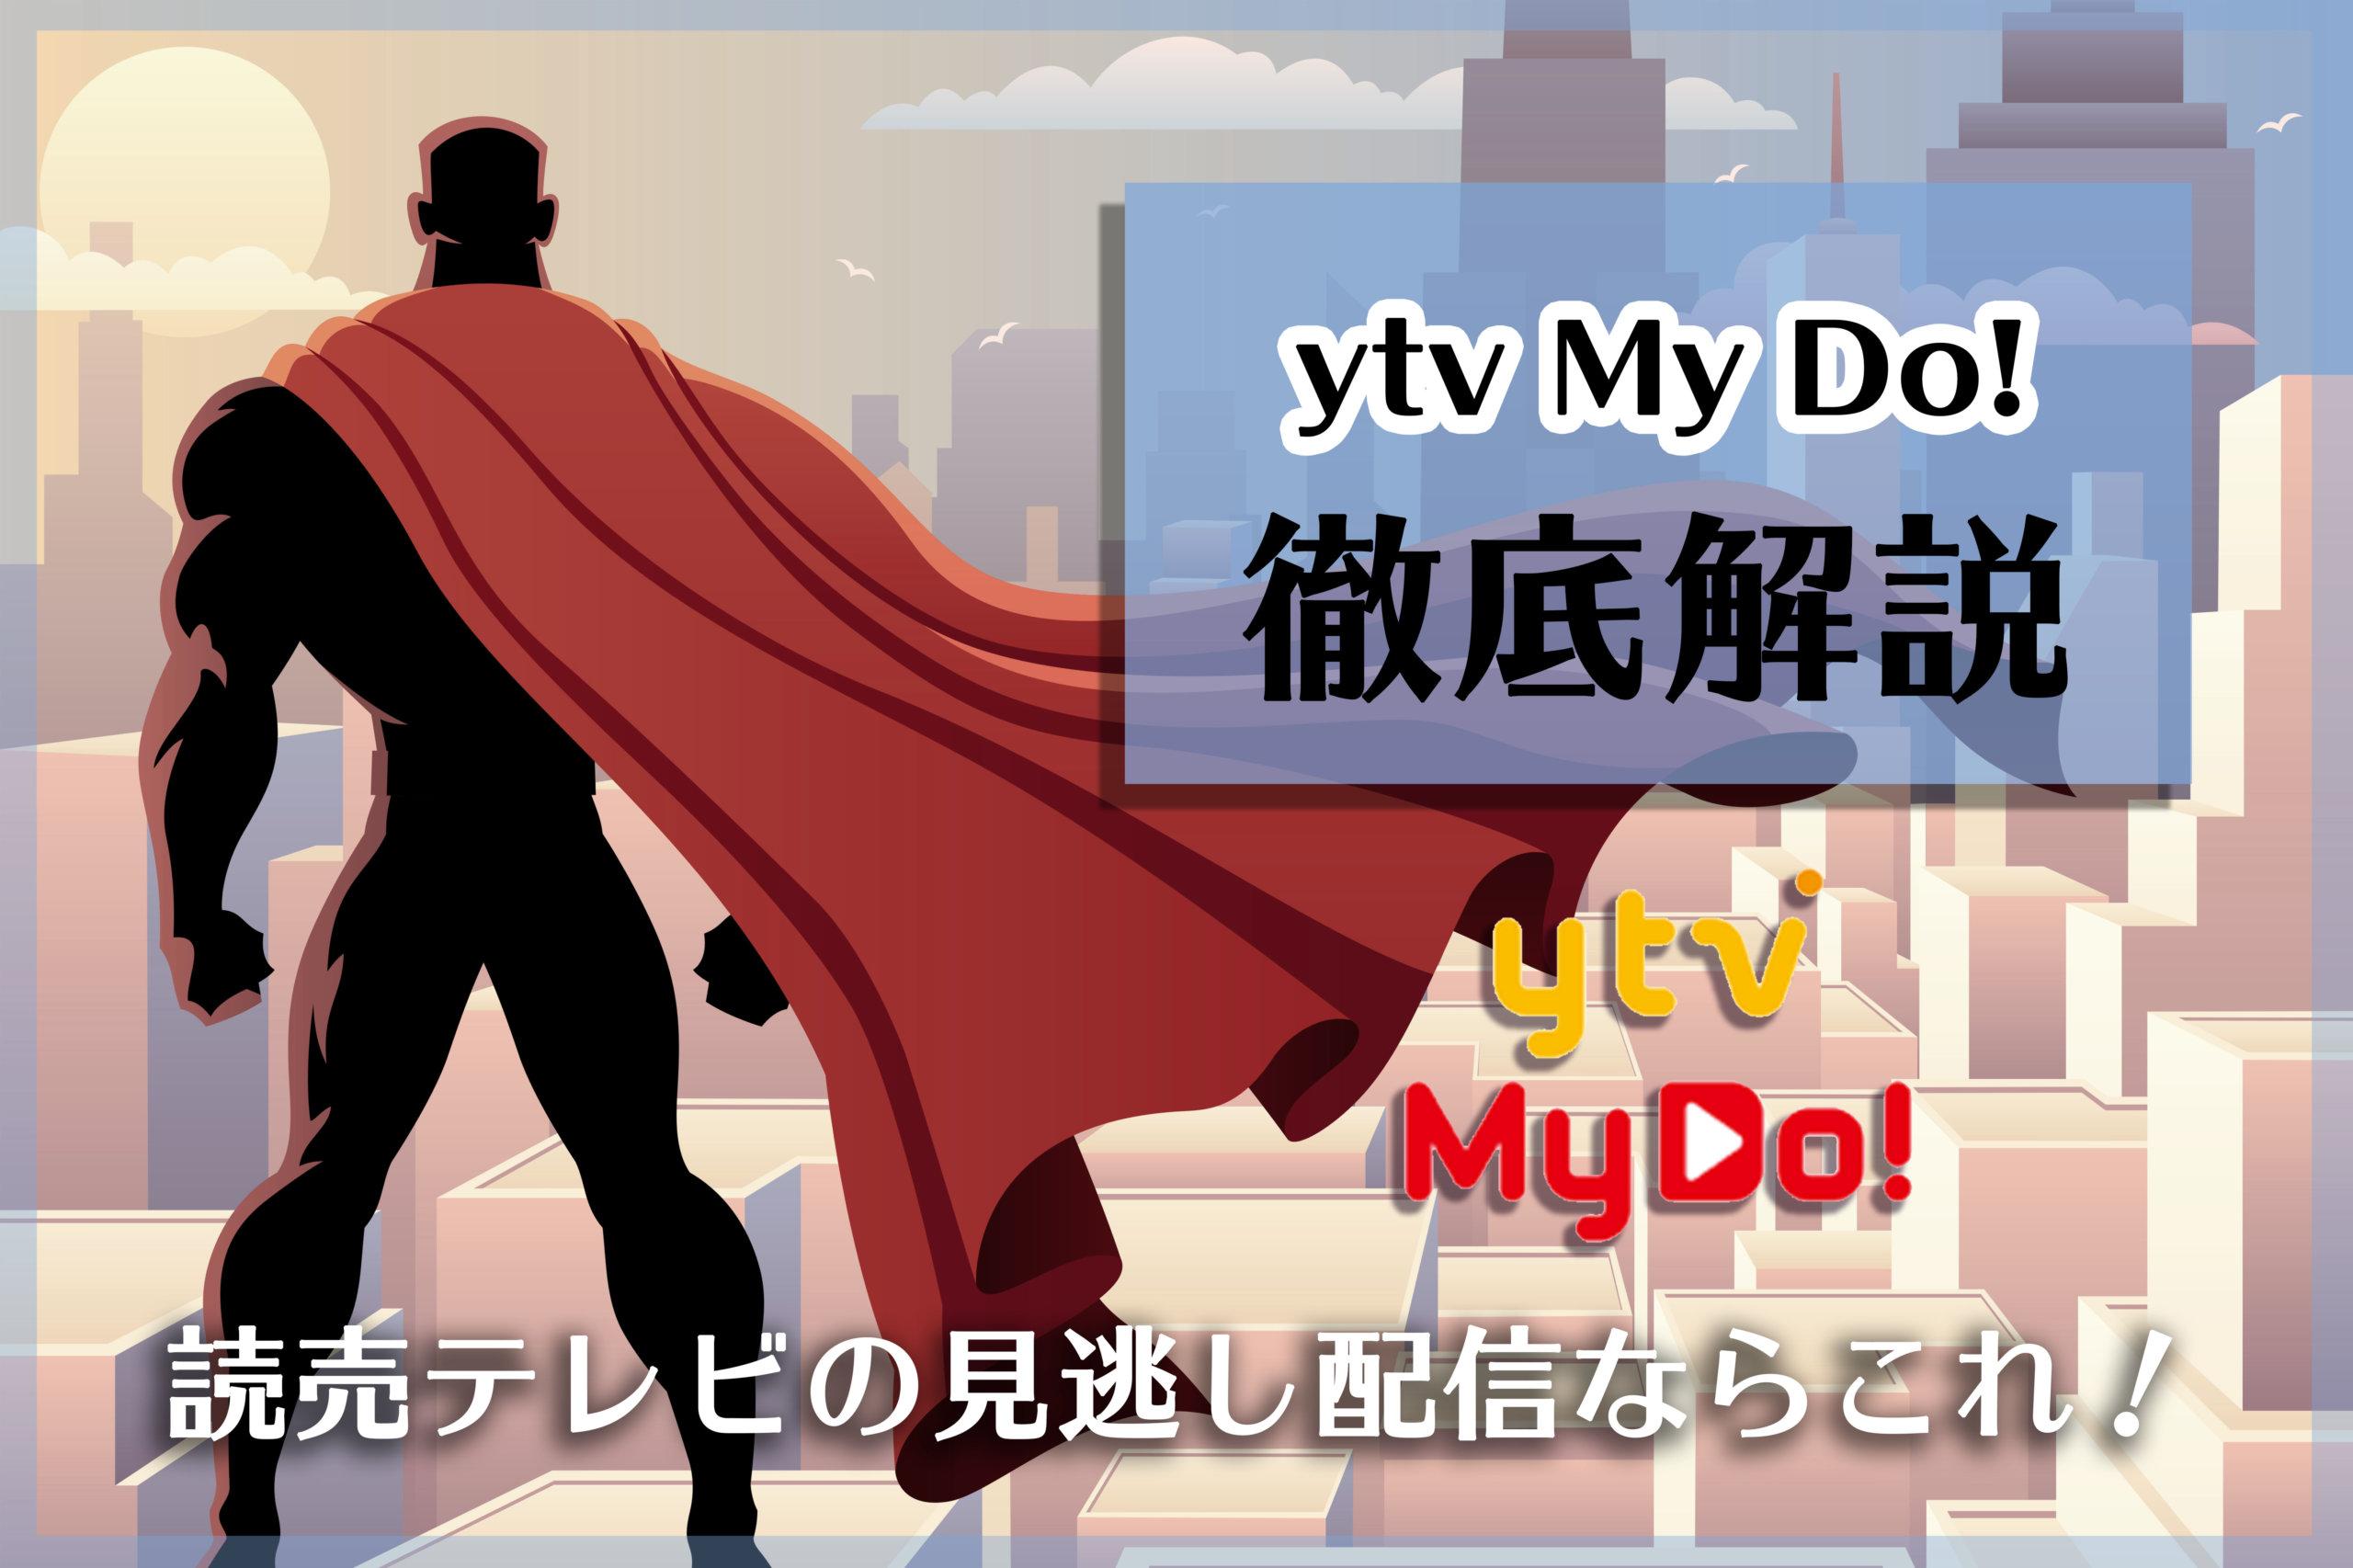 ytv My Do!